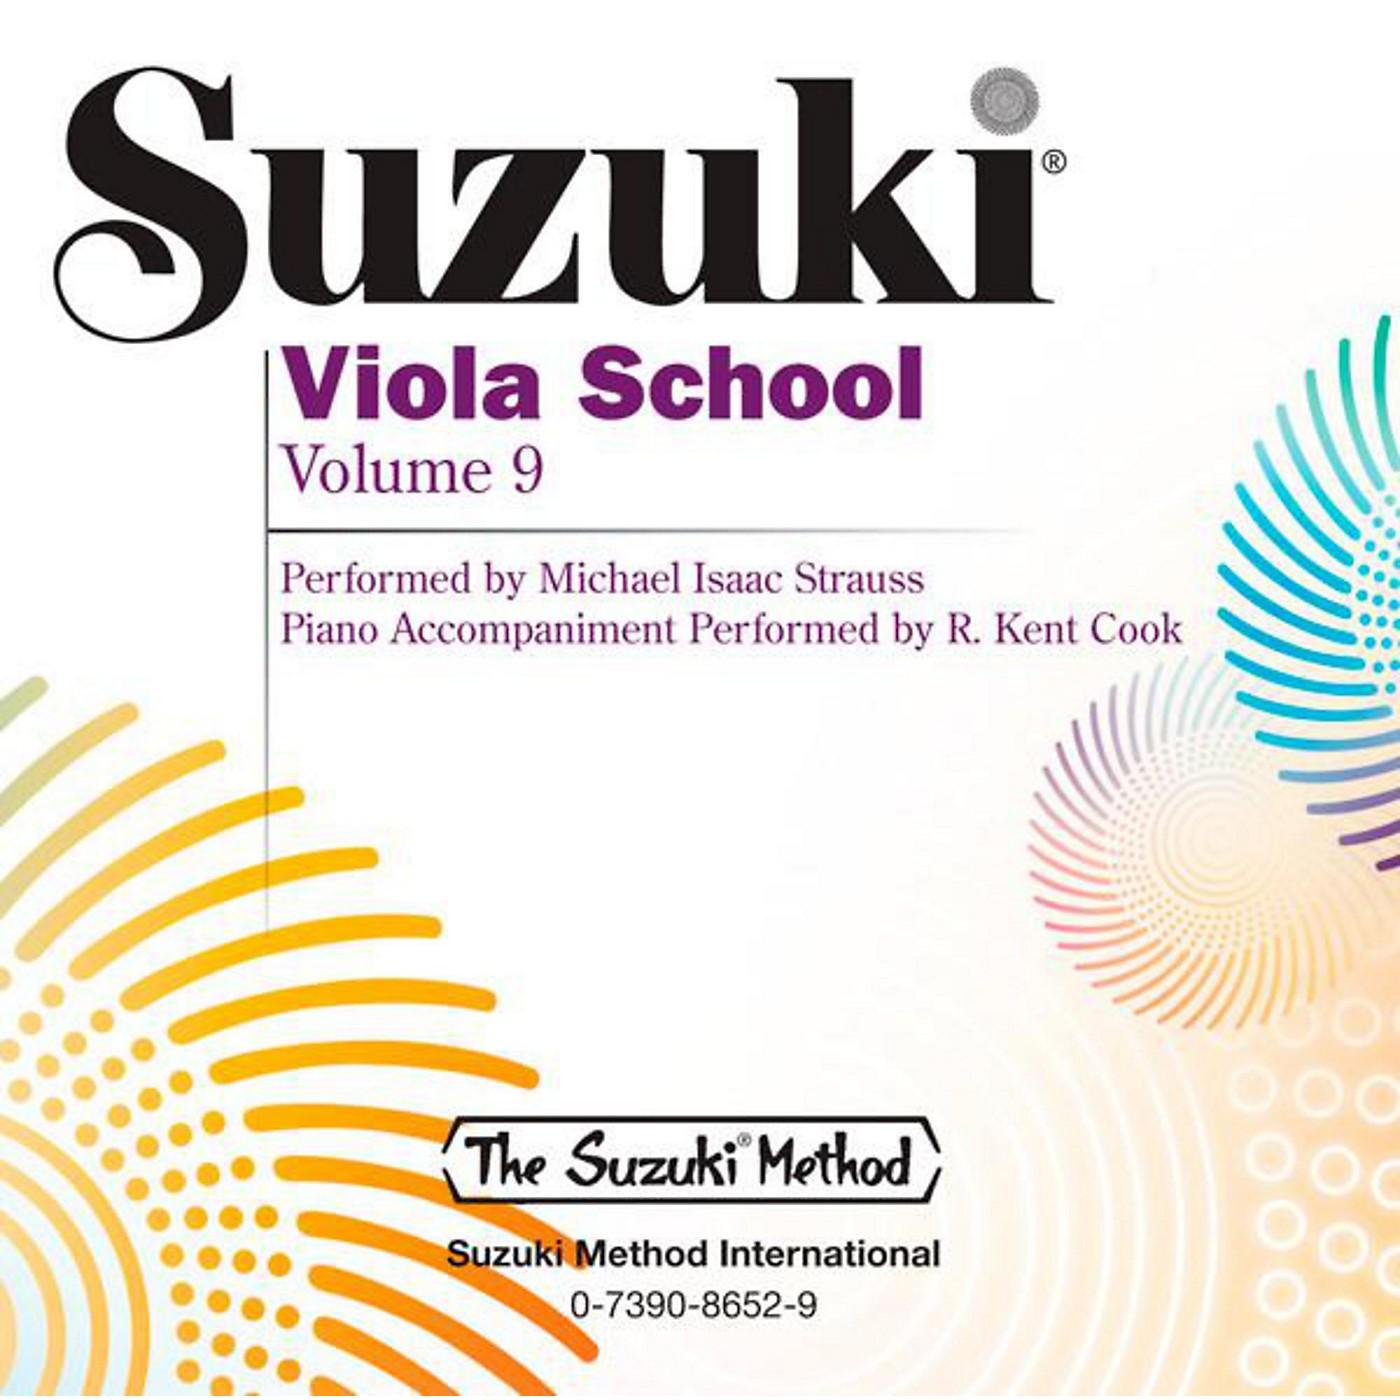 Suzuki Suzuki Viola School CD Volume 9 thumbnail